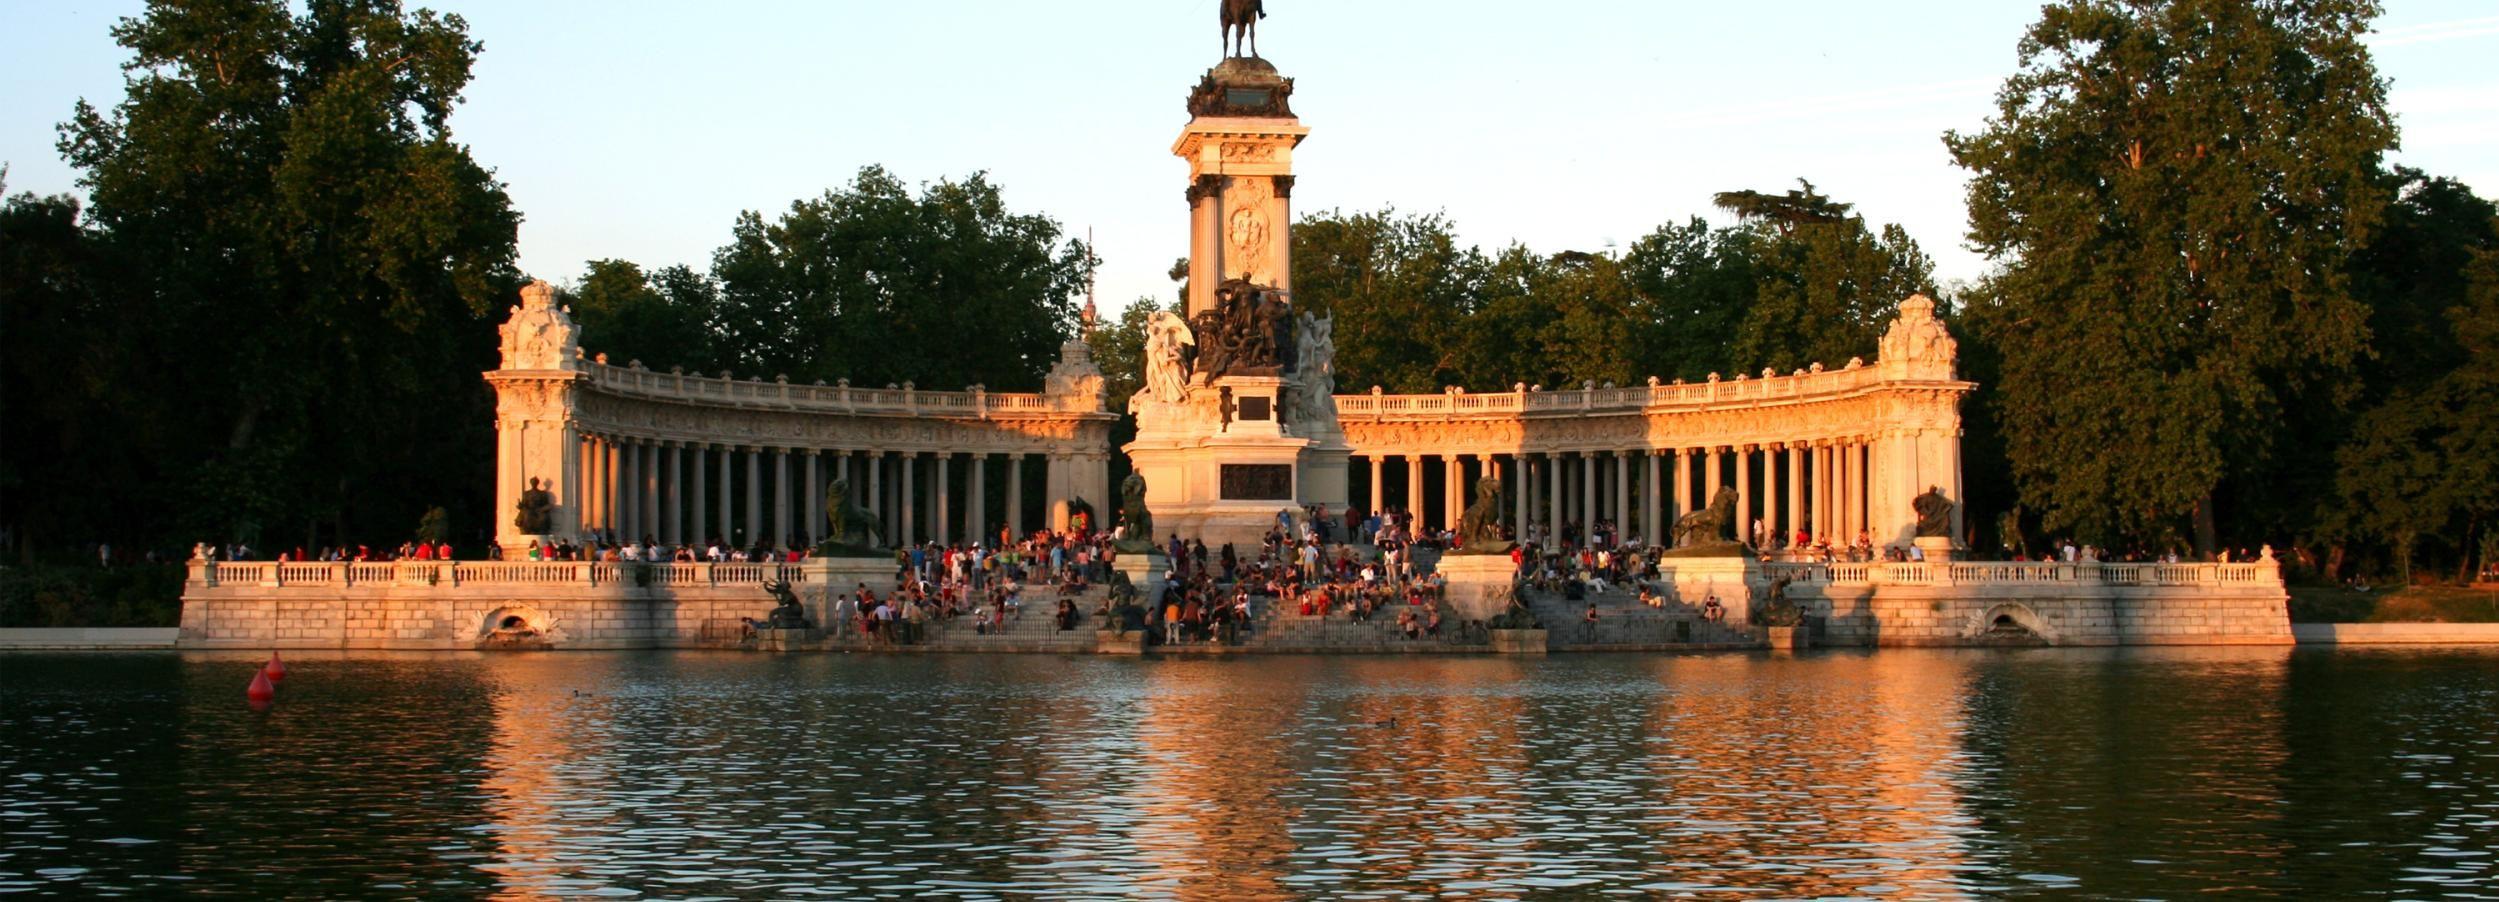 Private City Tour Madrid mit Fahrer und Guide